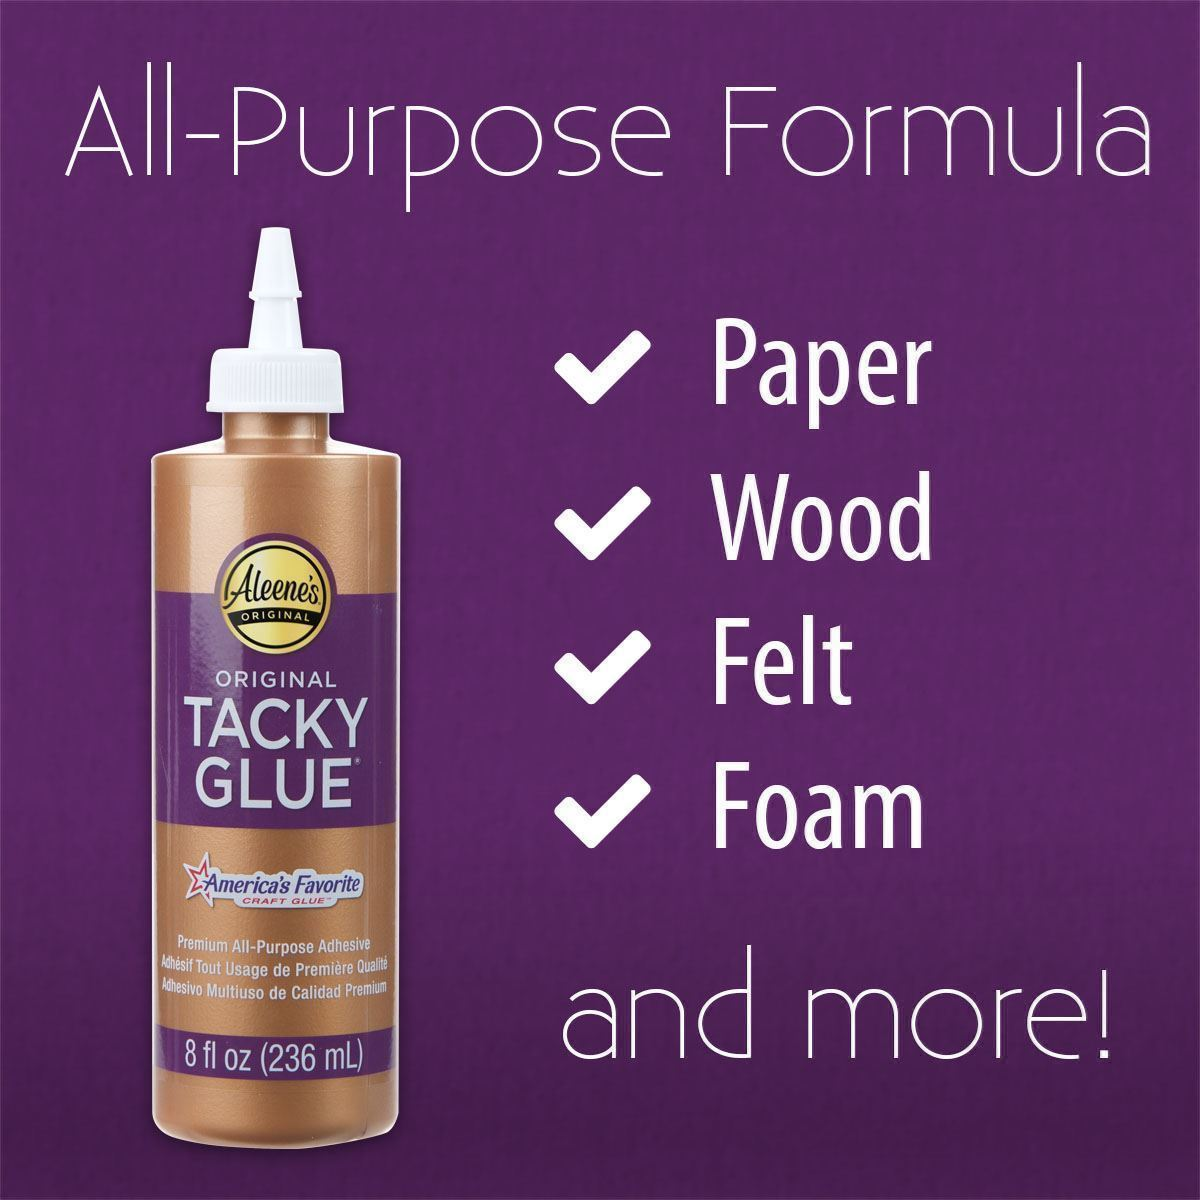 Original Tacky Glue All Purpose Glue work on paper, wood, foam, felt